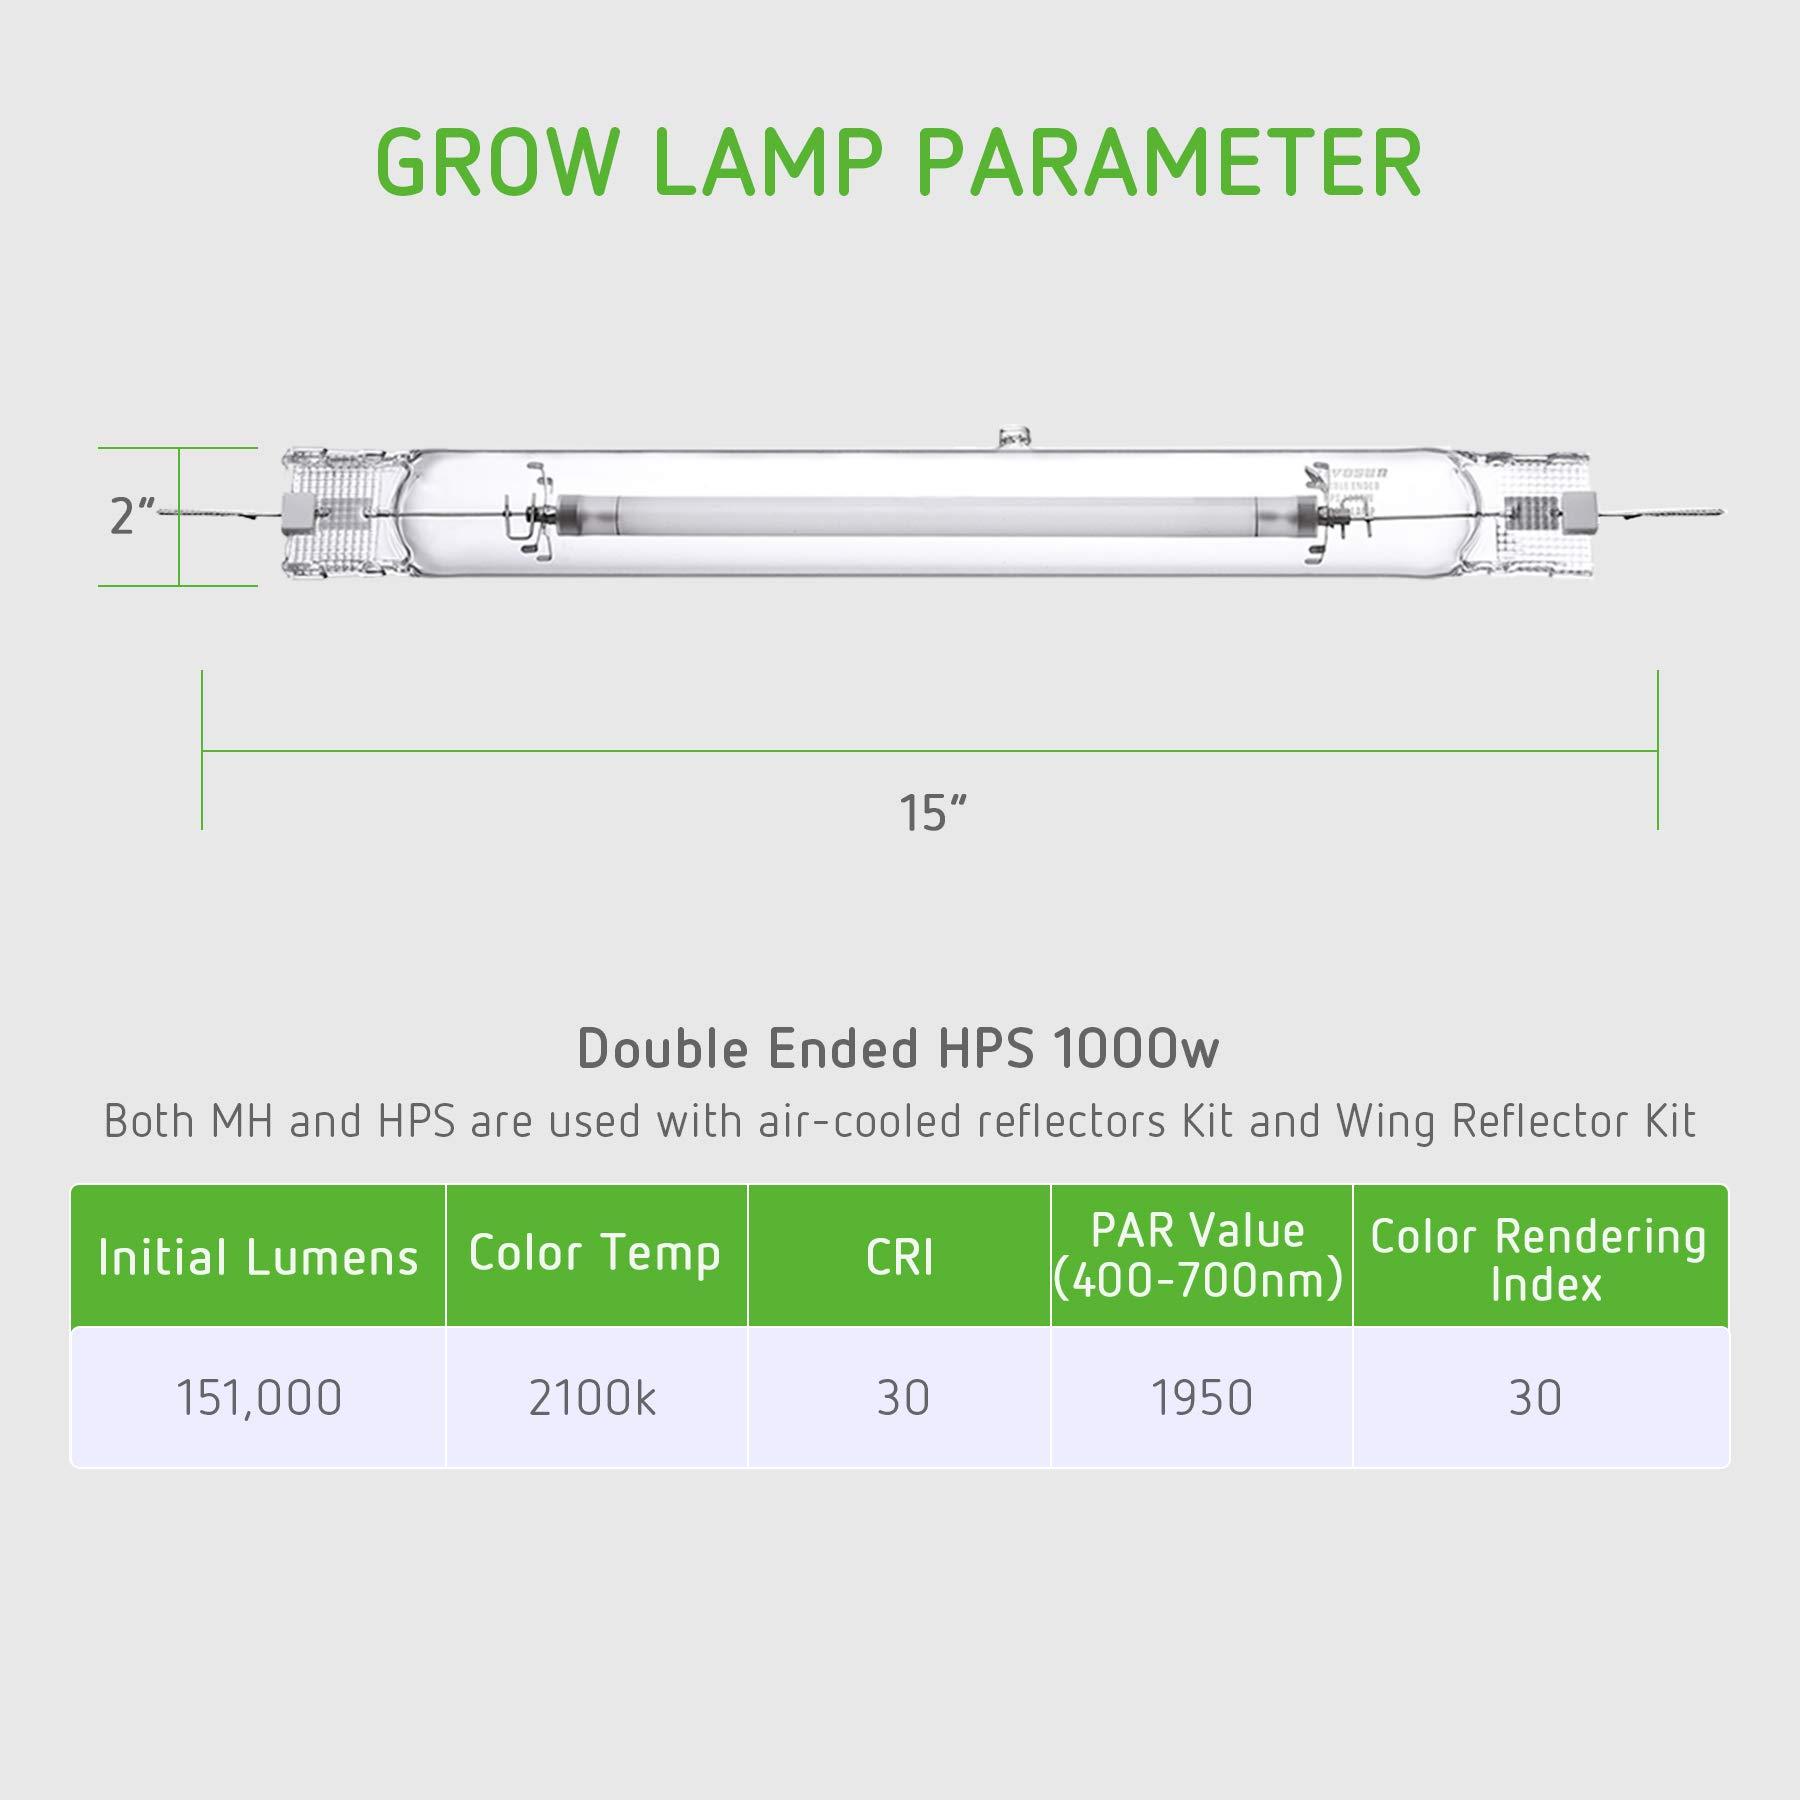 VIVOSUN 2 Pack of 1000W Double Ended High Pressure Sodium DE HPS Grow Bulb - Super Lumens 151,000 for Flourishing Growth [CCT 2100K] by VIVOSUN (Image #2)